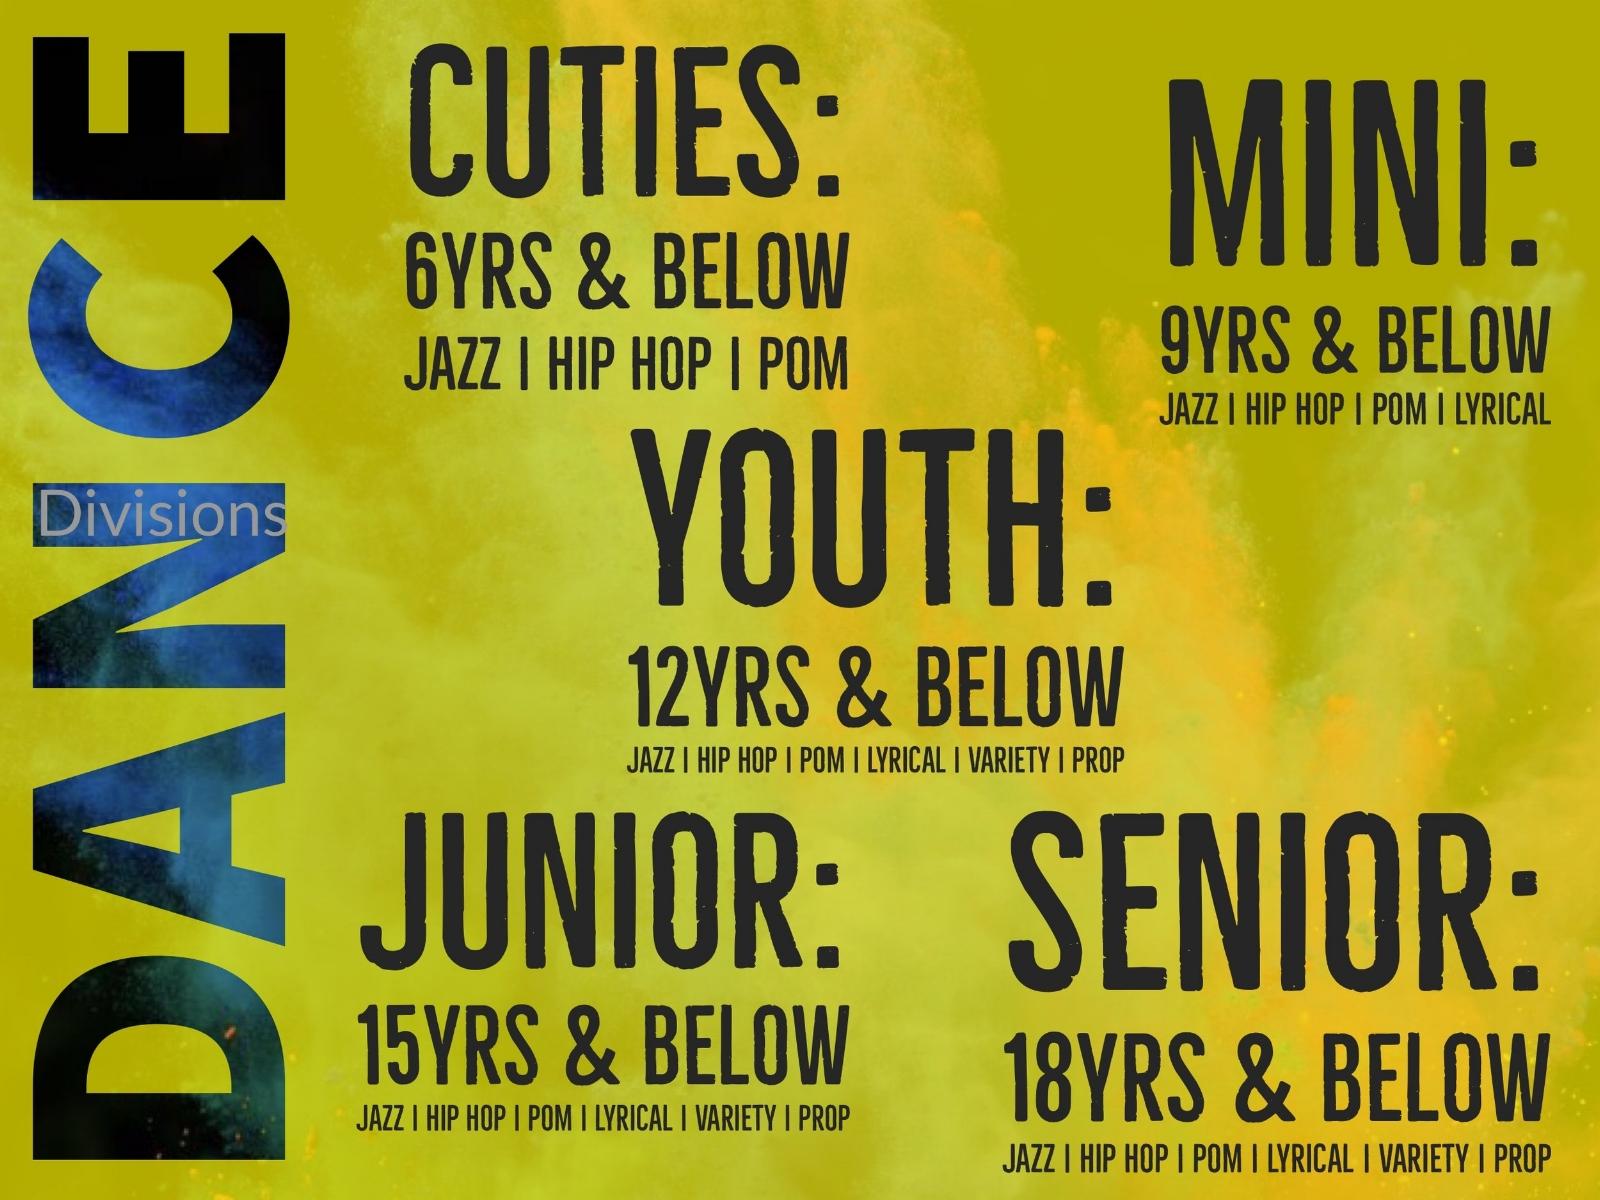 Dance Division -